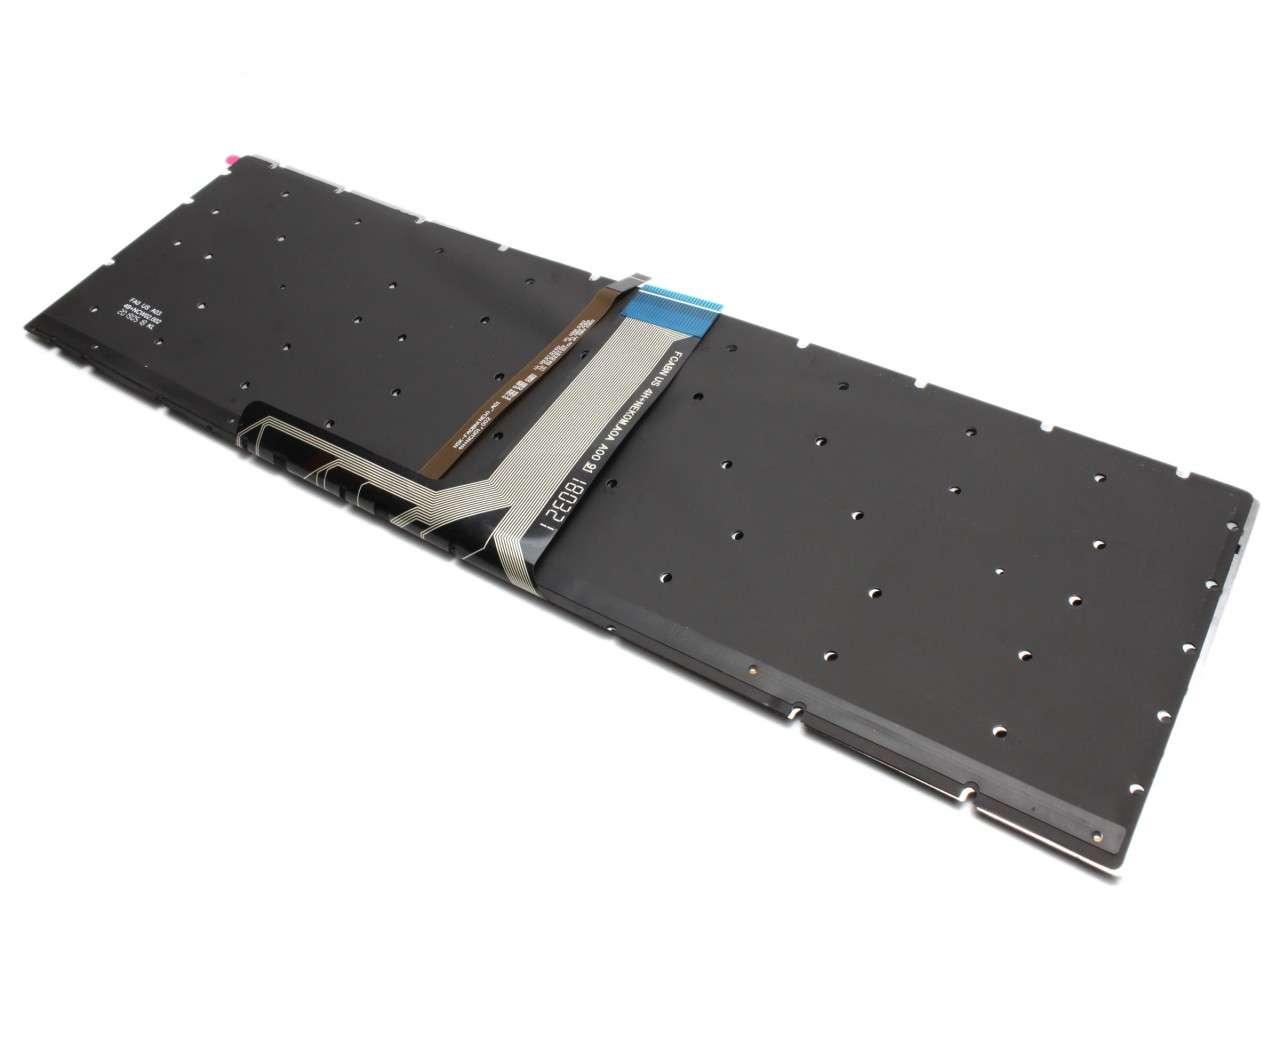 Tastatura MSI WS72 6QJ iluminata layout US fara rama enter mic imagine powerlaptop.ro 2021